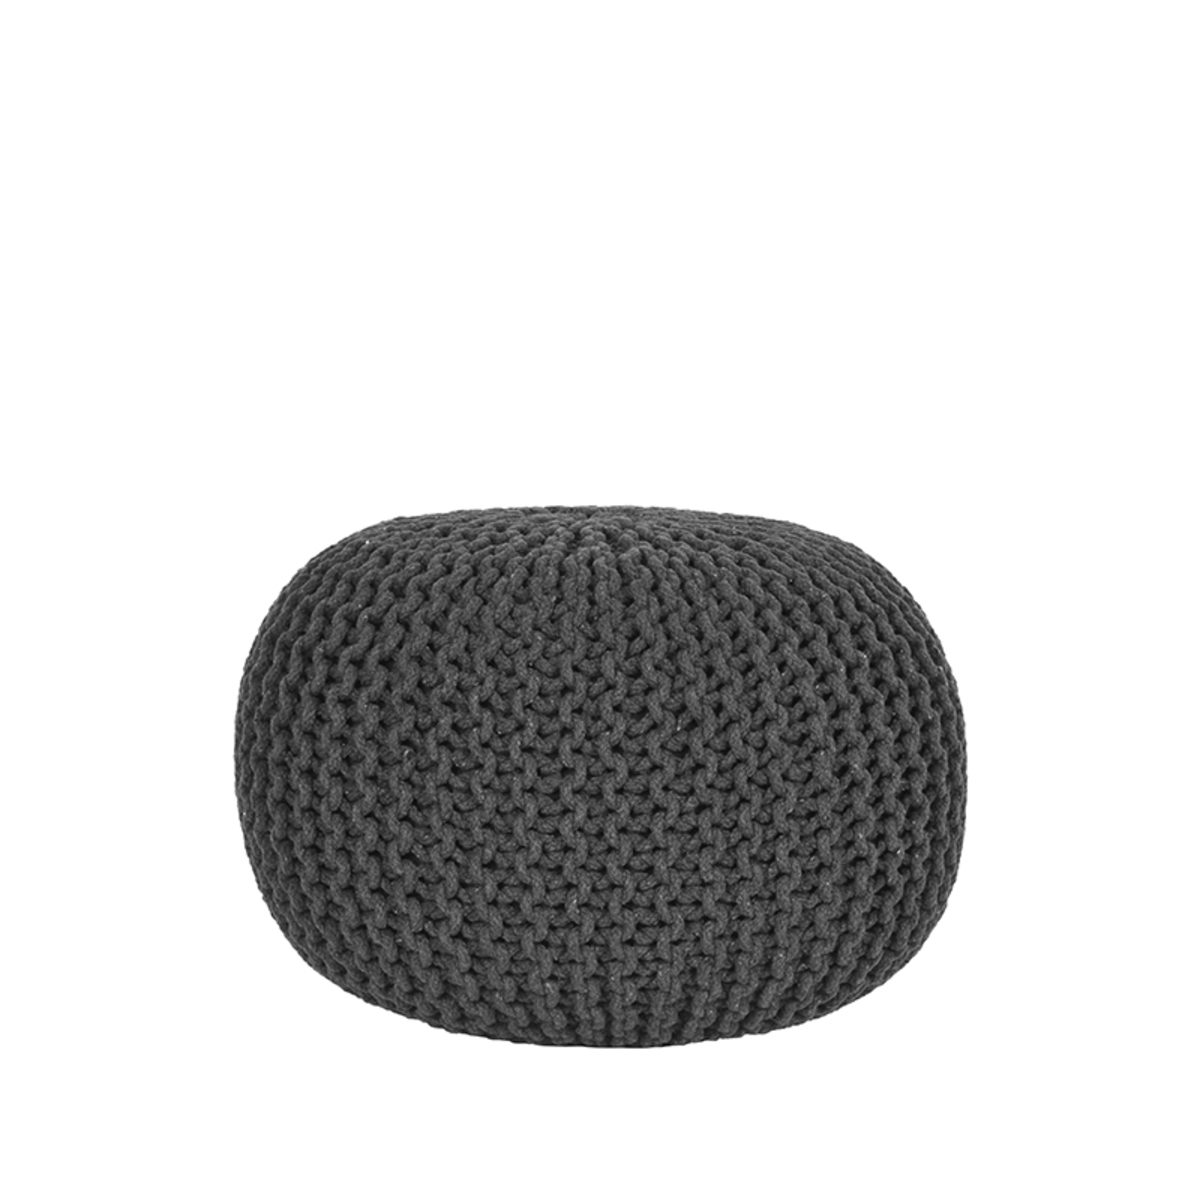 LABEL51 Poef Knitted - Antraciet - Katoen - M